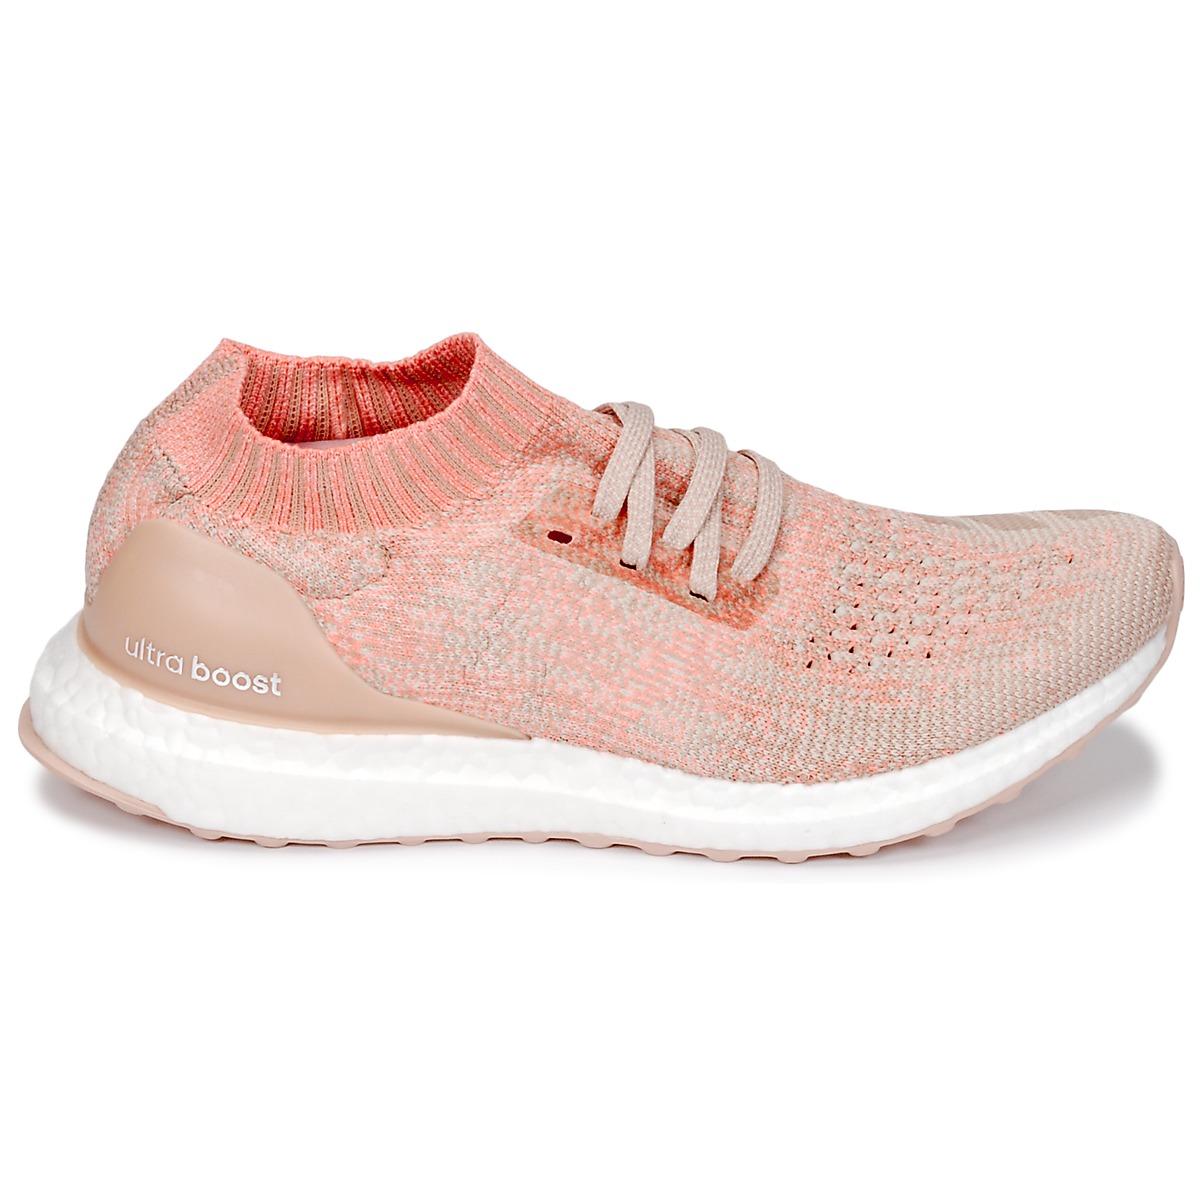 Adidas Ultra Boost donne